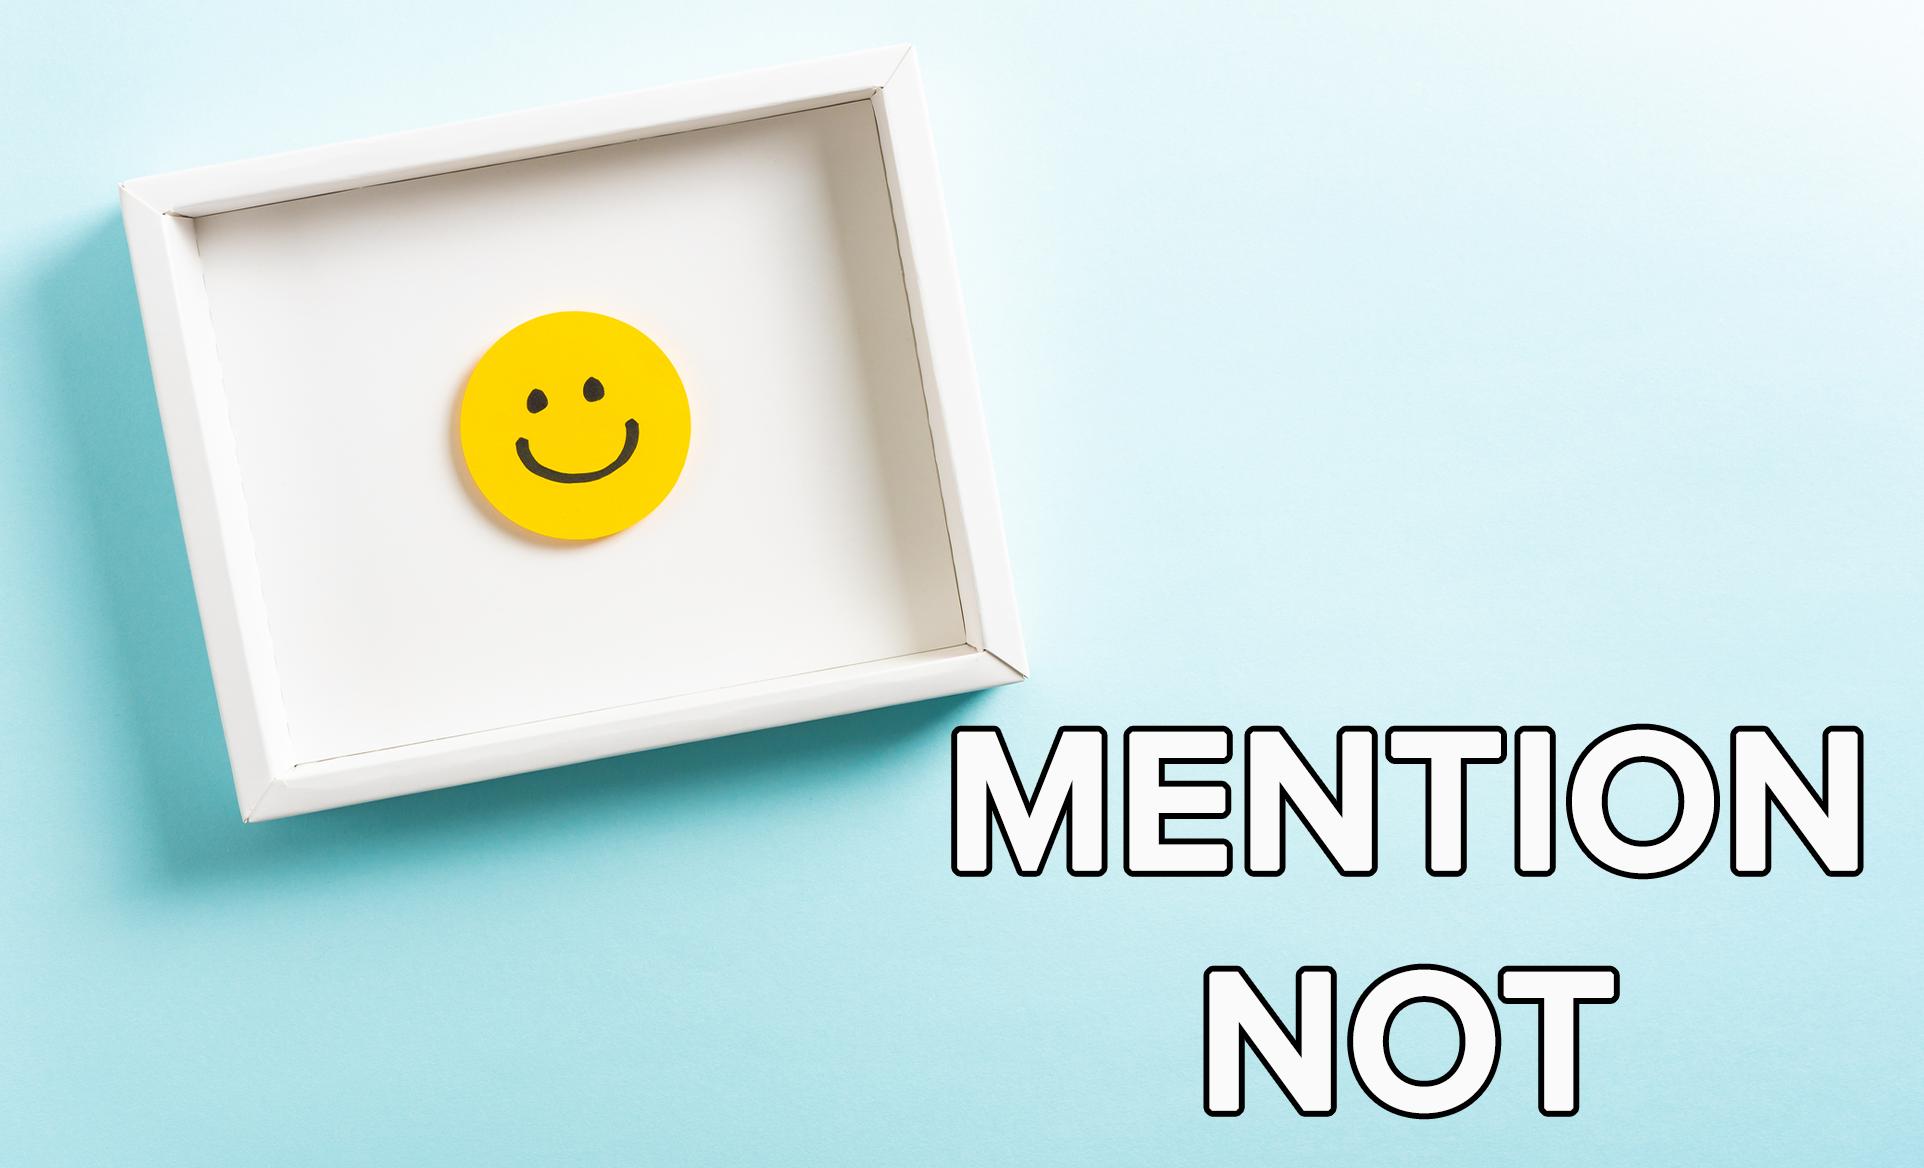 A photo-frame has a smile emoji inside it